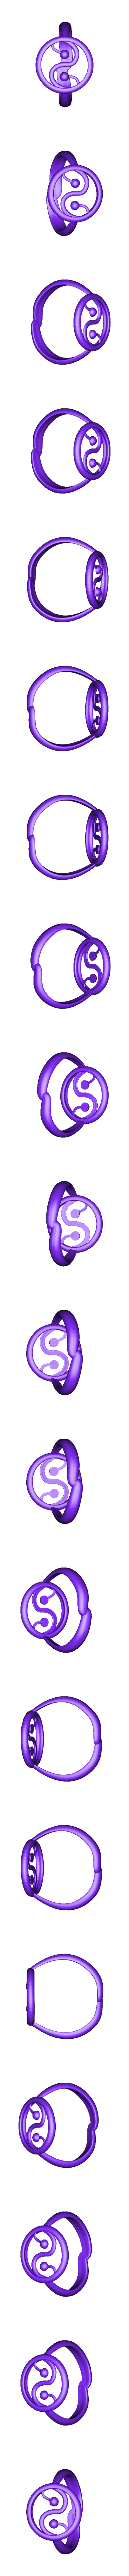 yingyang_ring.stl Download free STL file Anillo Yin -Yang • Object to 3D print, enriquelsanfer